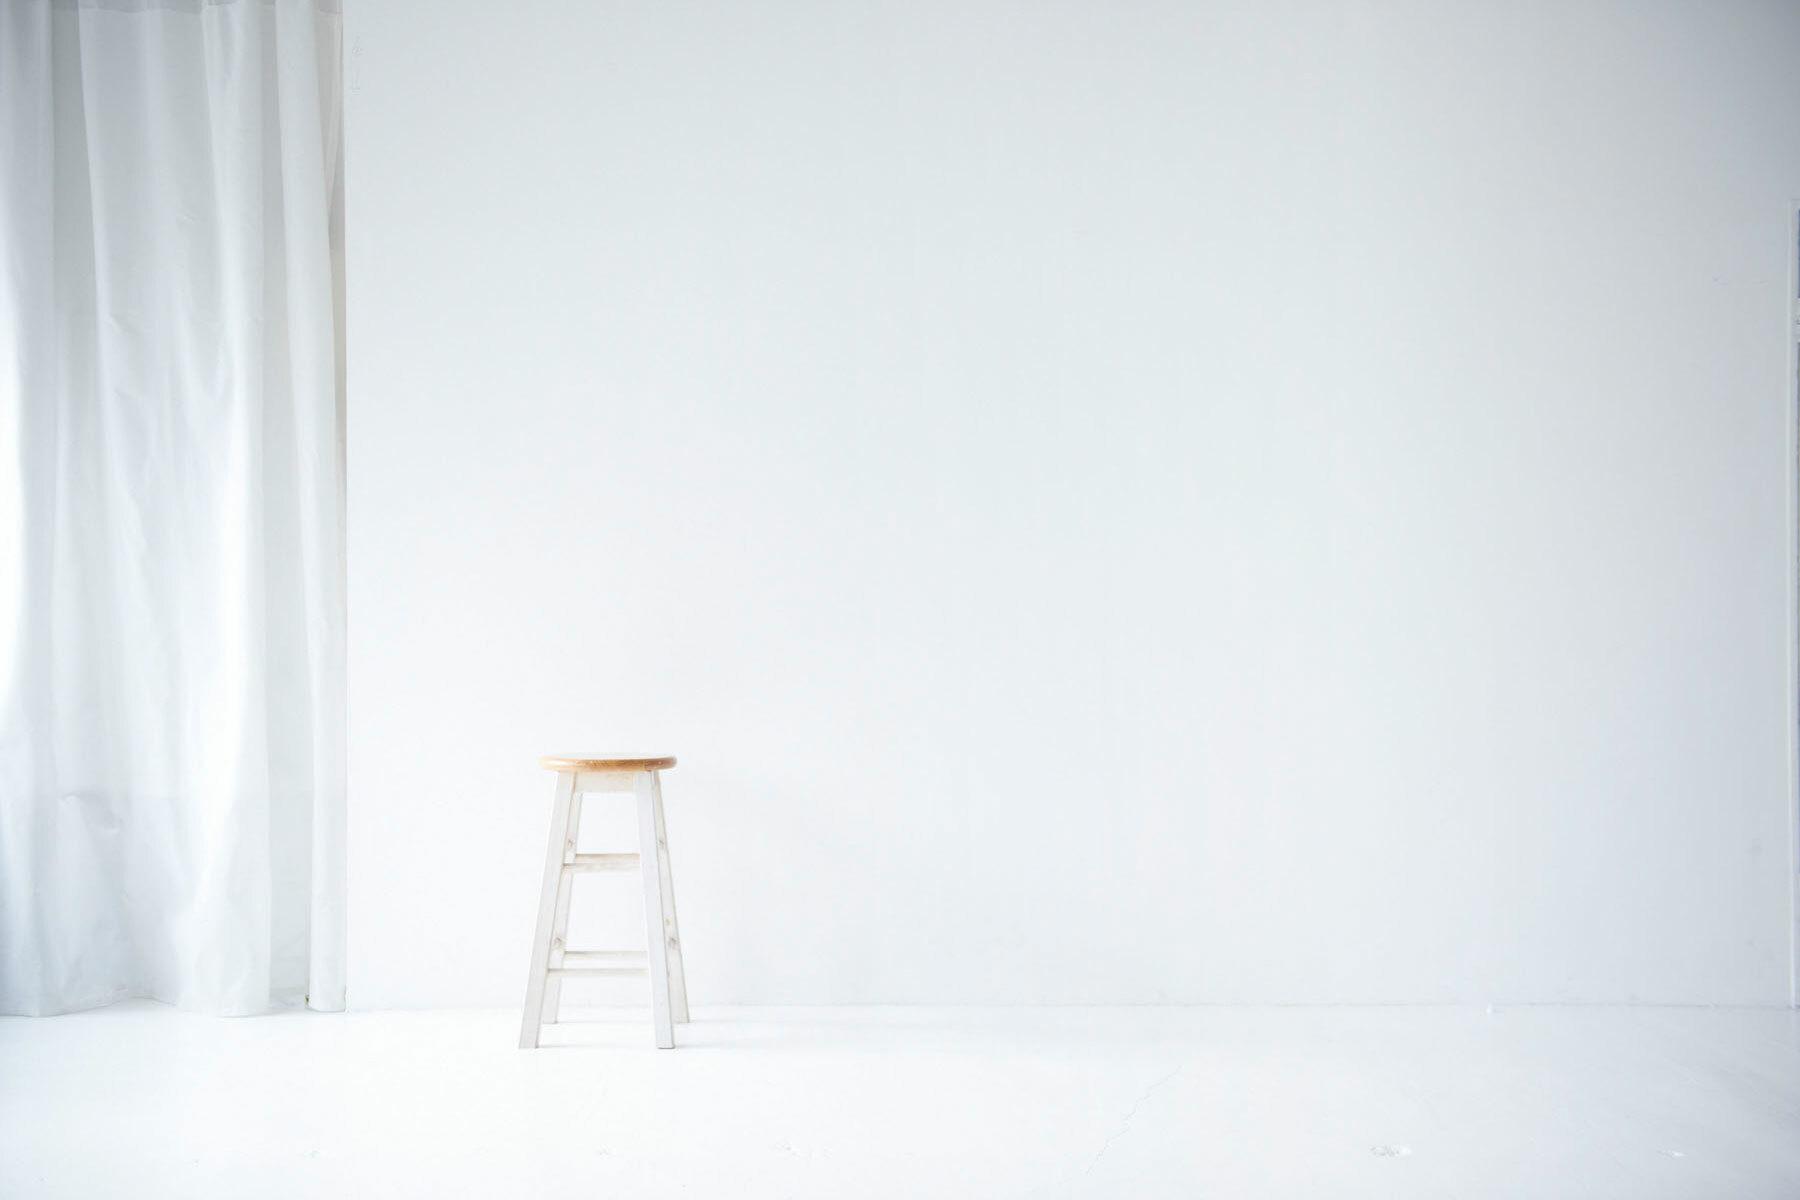 STUDIO FOGLIA 2st (スタジオ フォグリア 2st)白レンガと明るい空間